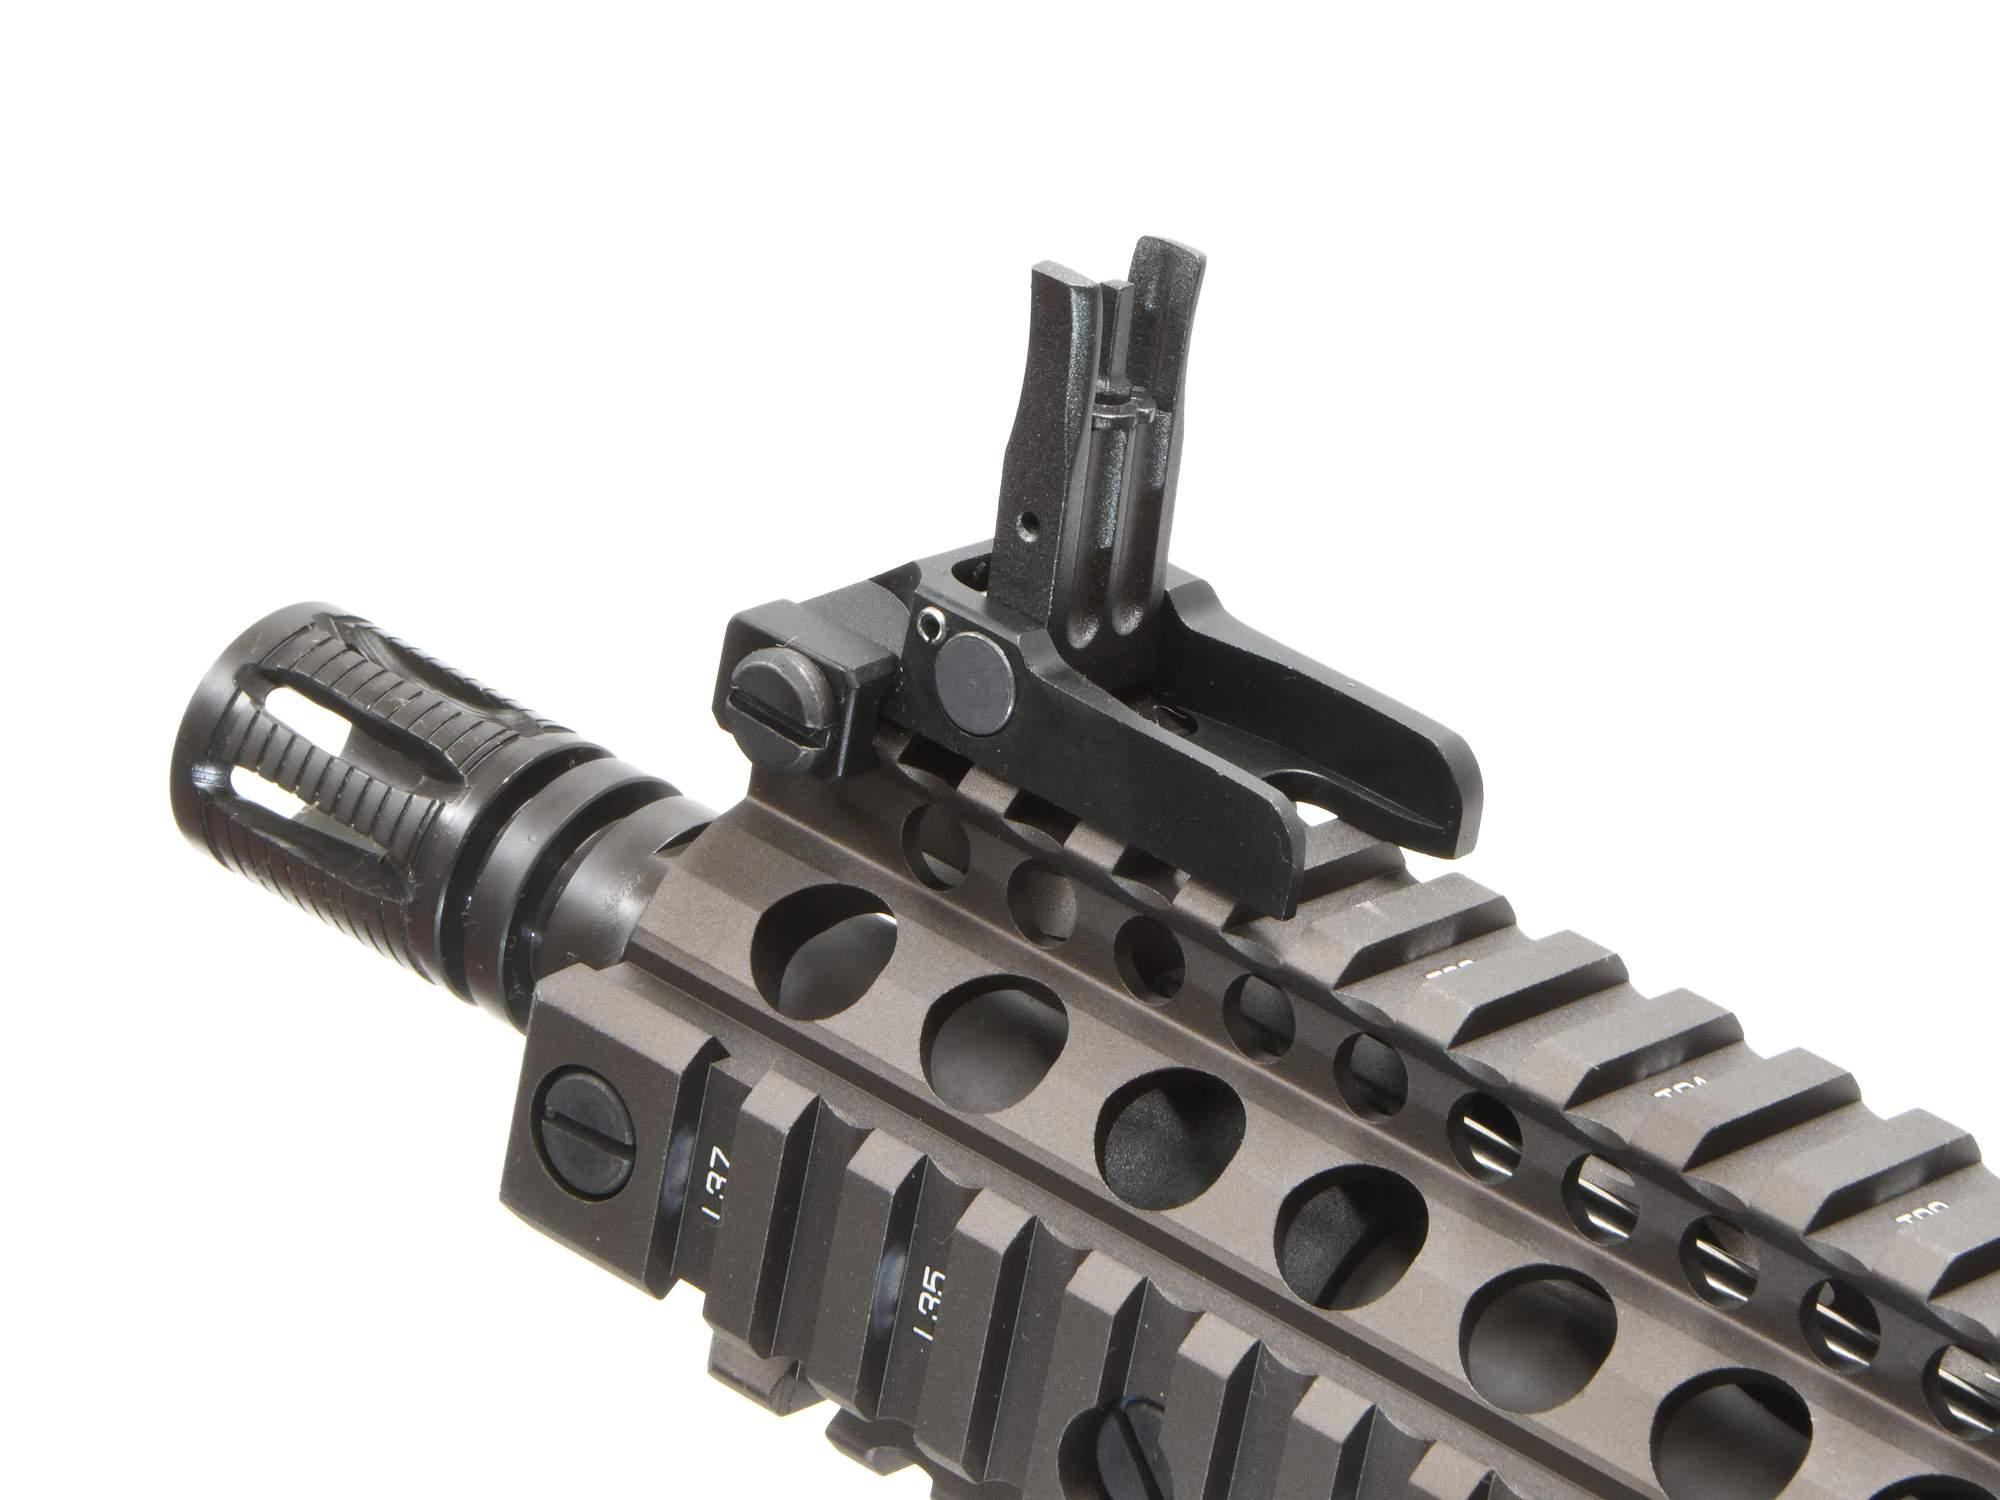 CyberGun Colt MK18 MOD1 GBBR V2 (JPver.) [ガスガン]